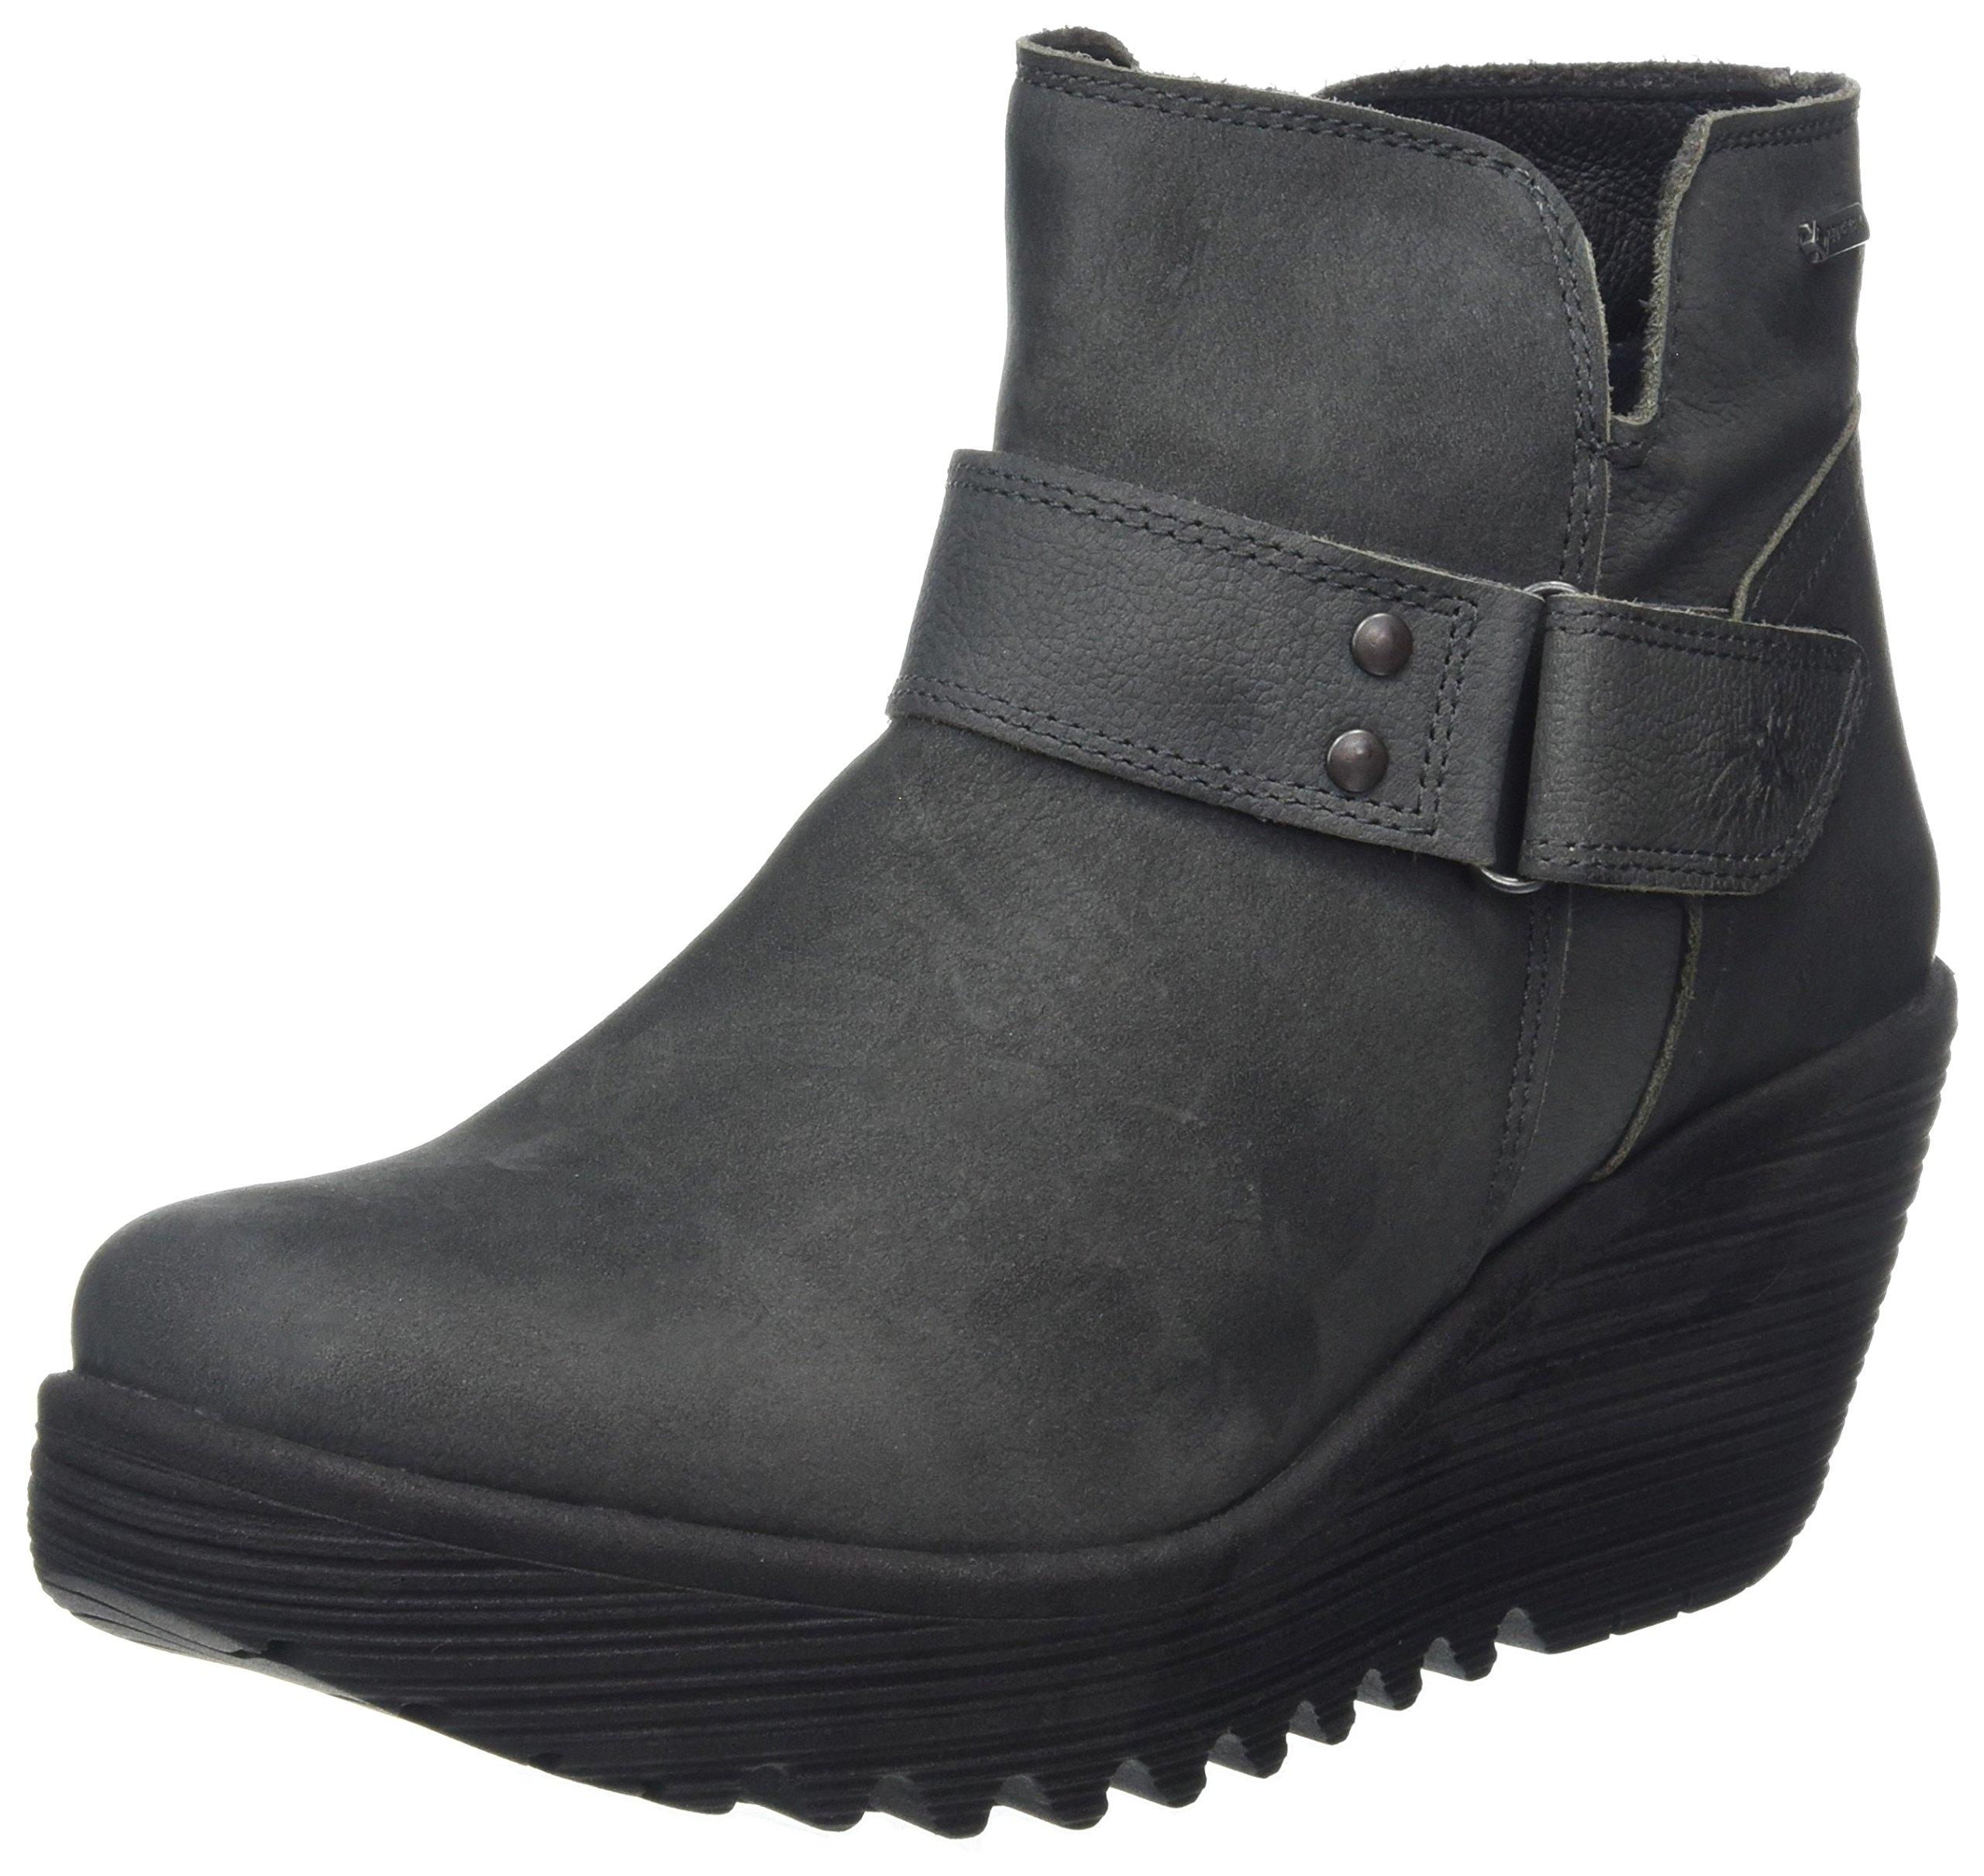 FLY London Womens Yock062Fly Mid Calf Grey Boot - 37